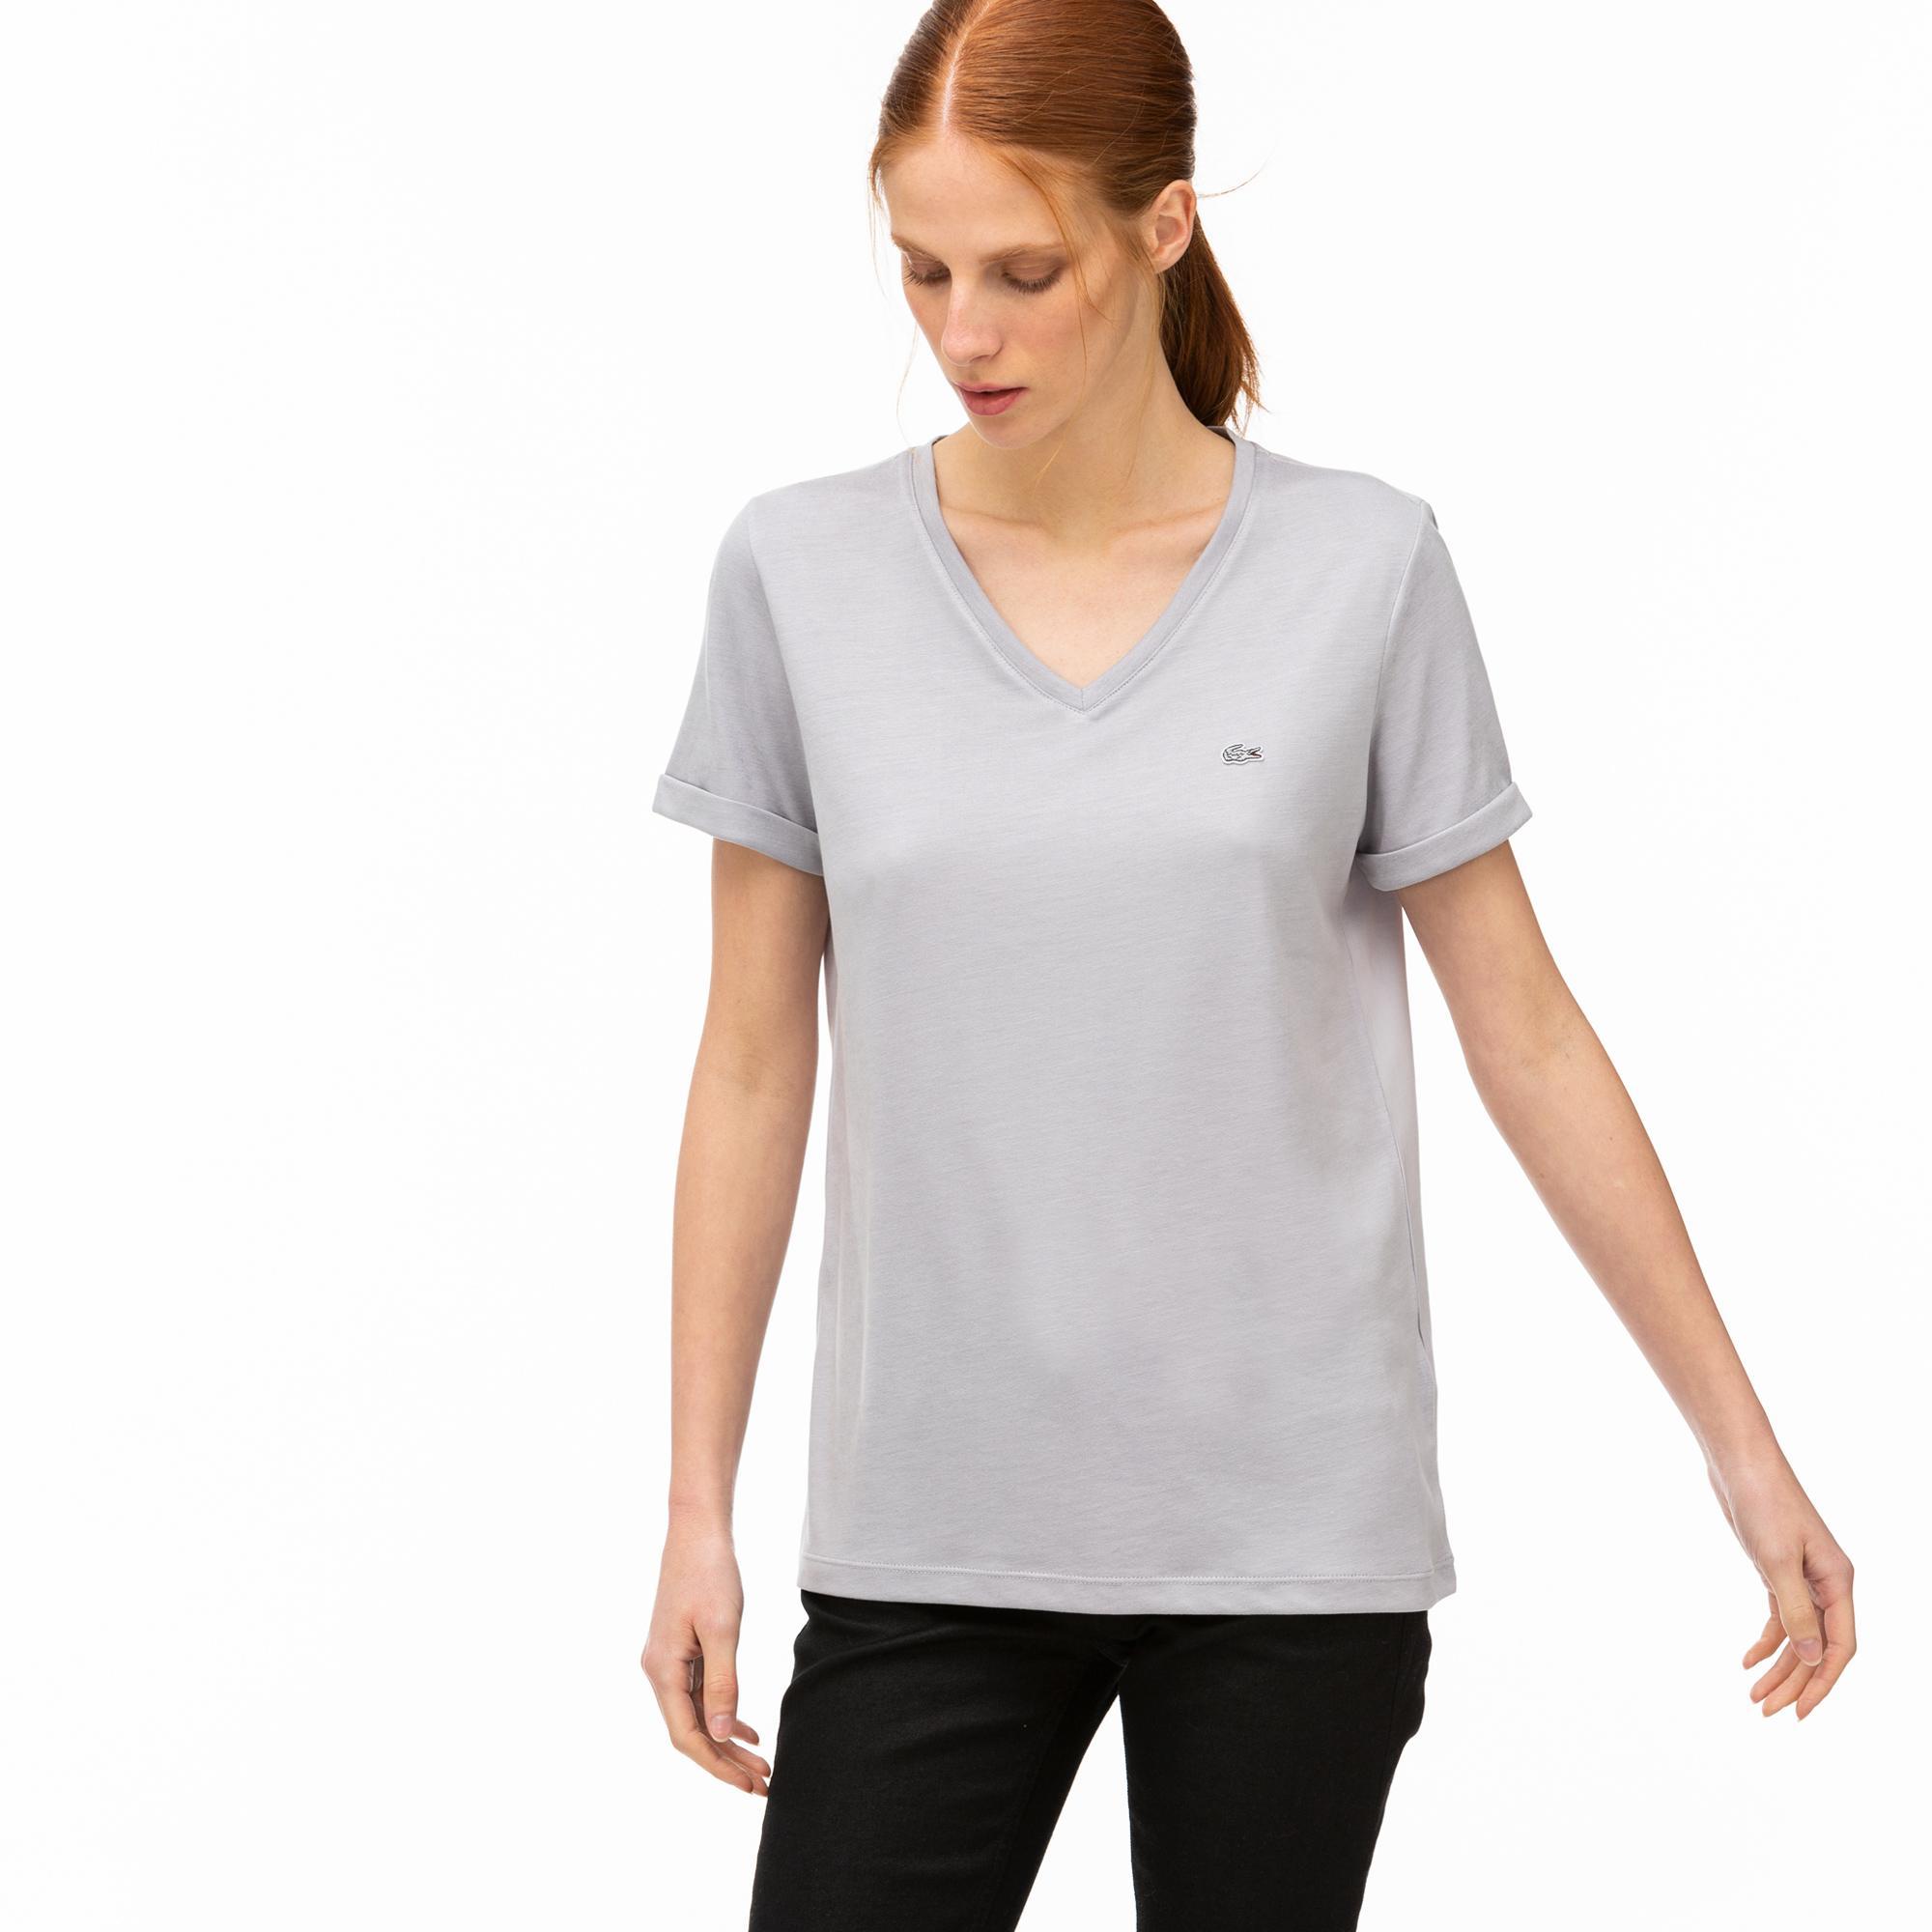 Lacoste Kadın V Yaka Gri T-Shirt